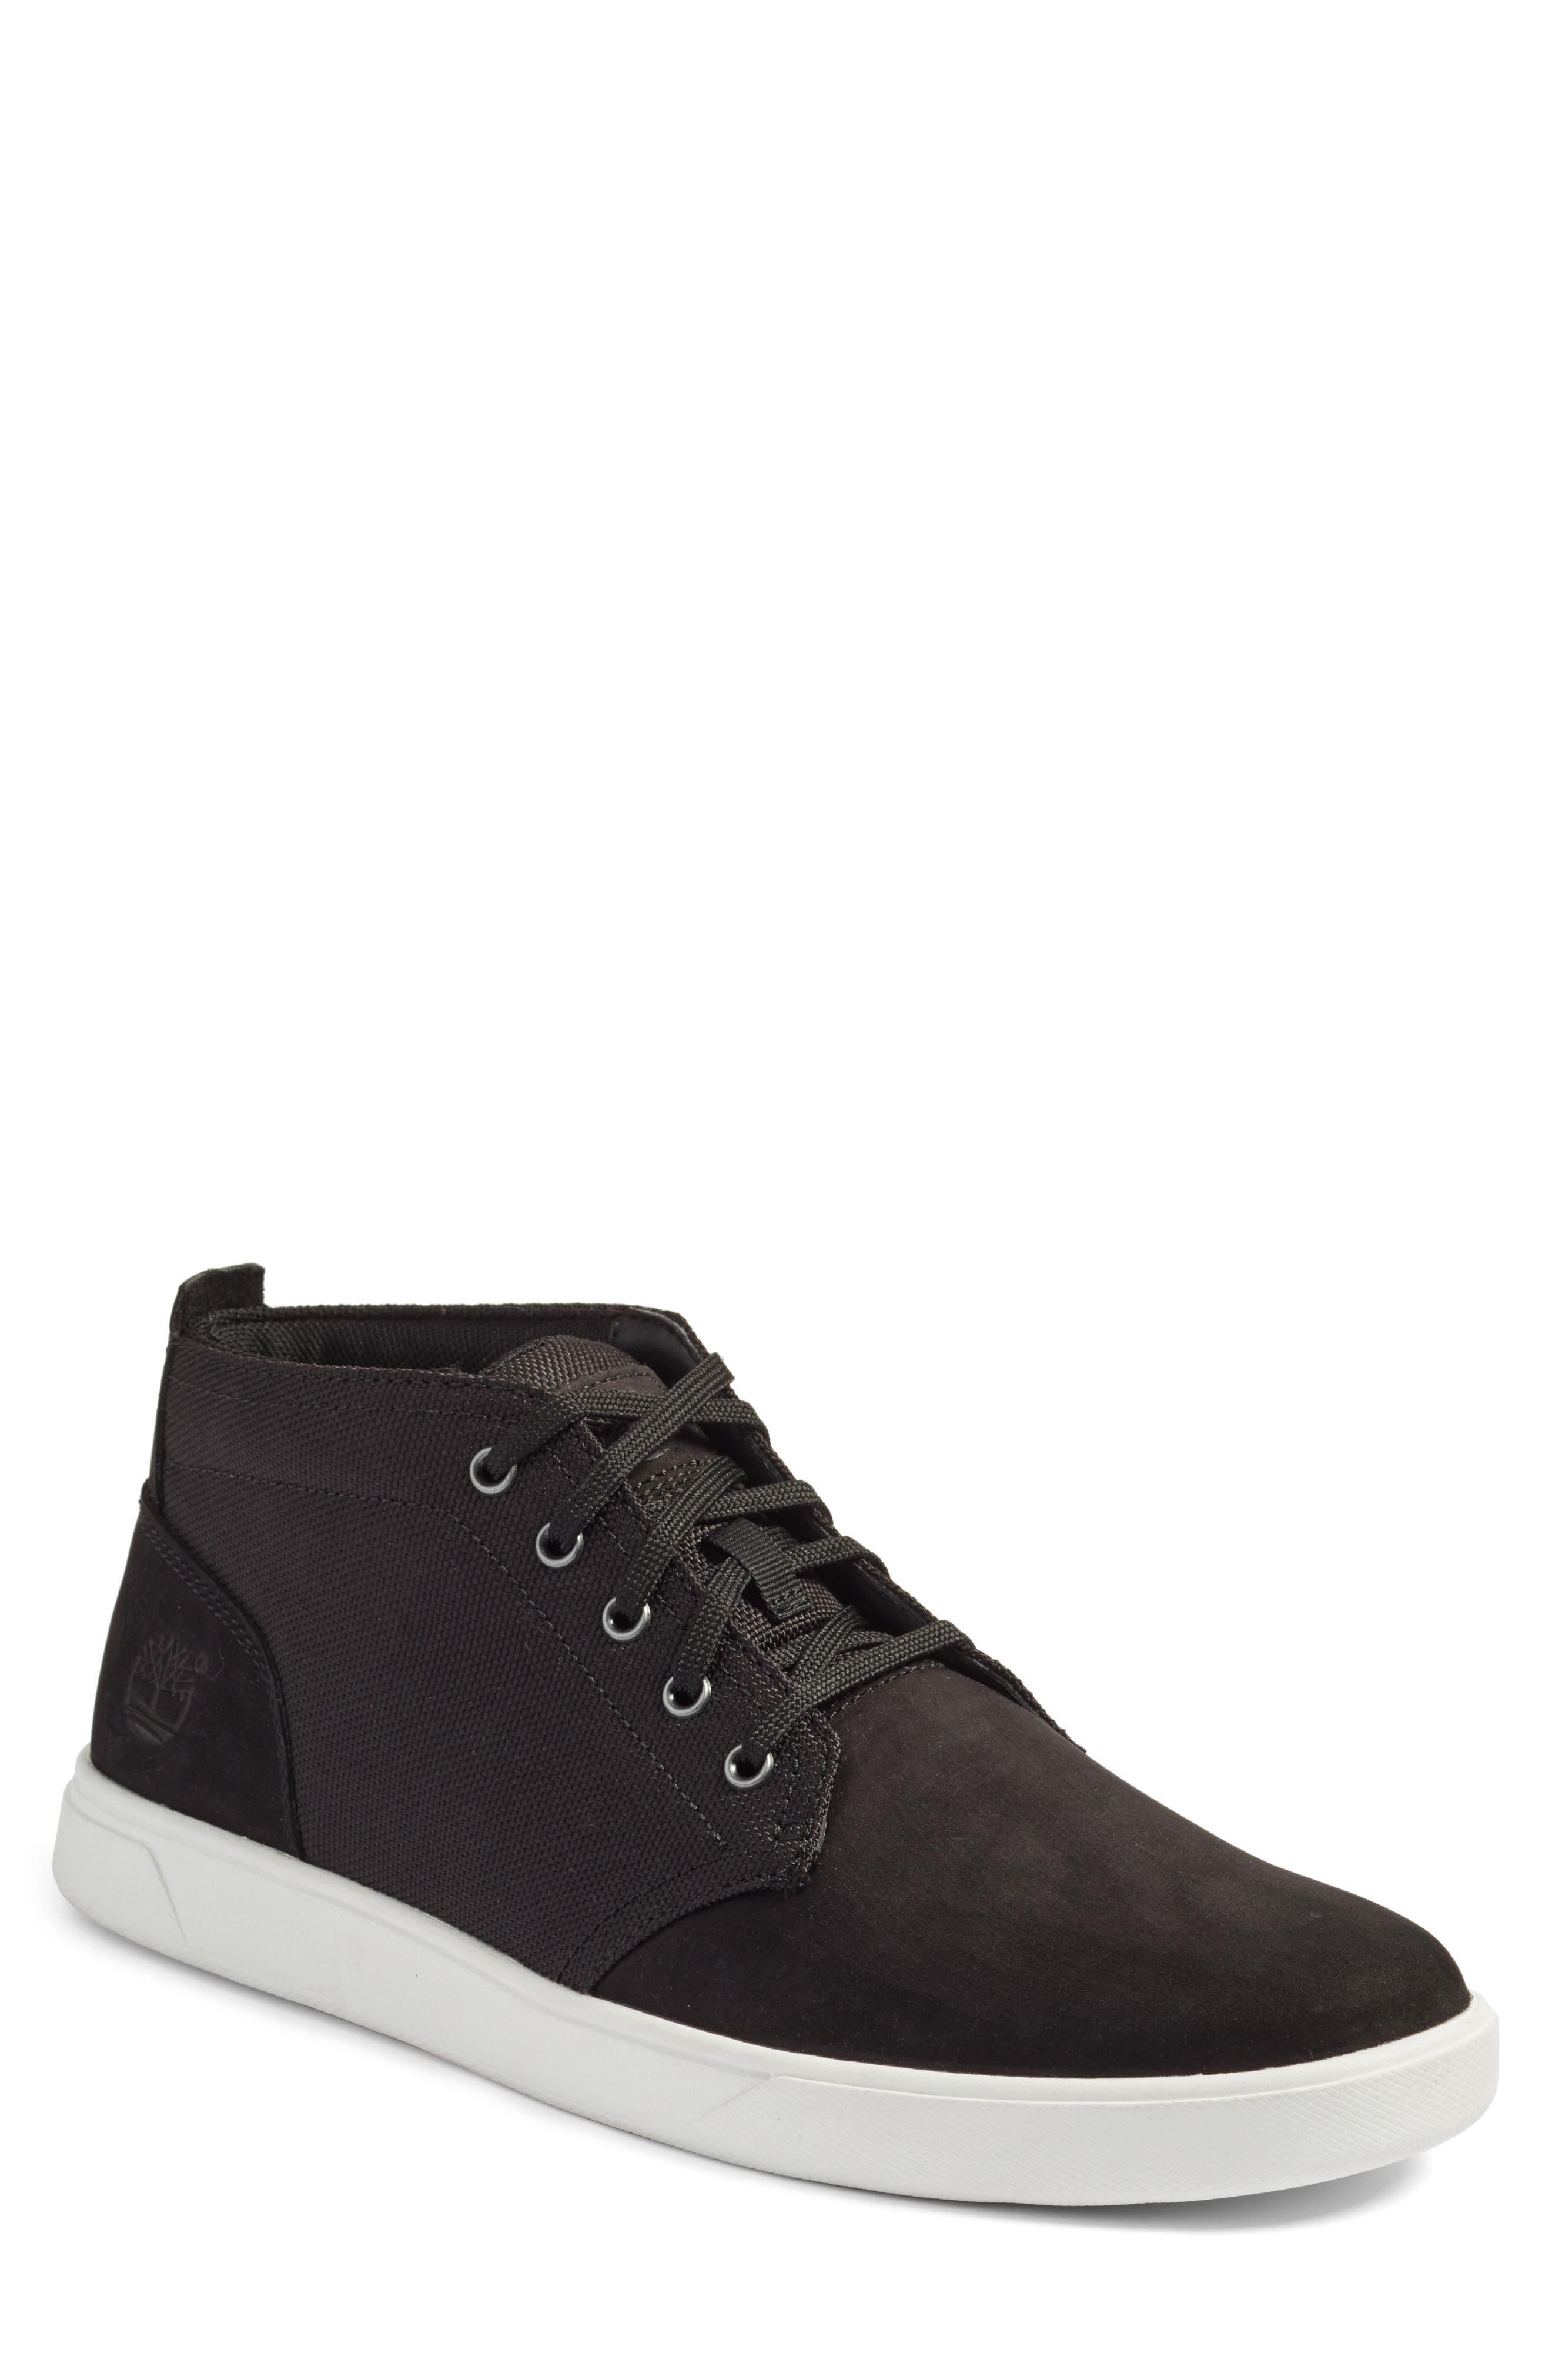 Earthkeepers<sup>™</sup> 'Groveton' Chukka Sneaker,                         Main,                         color, Black Nubuck/ Canvas